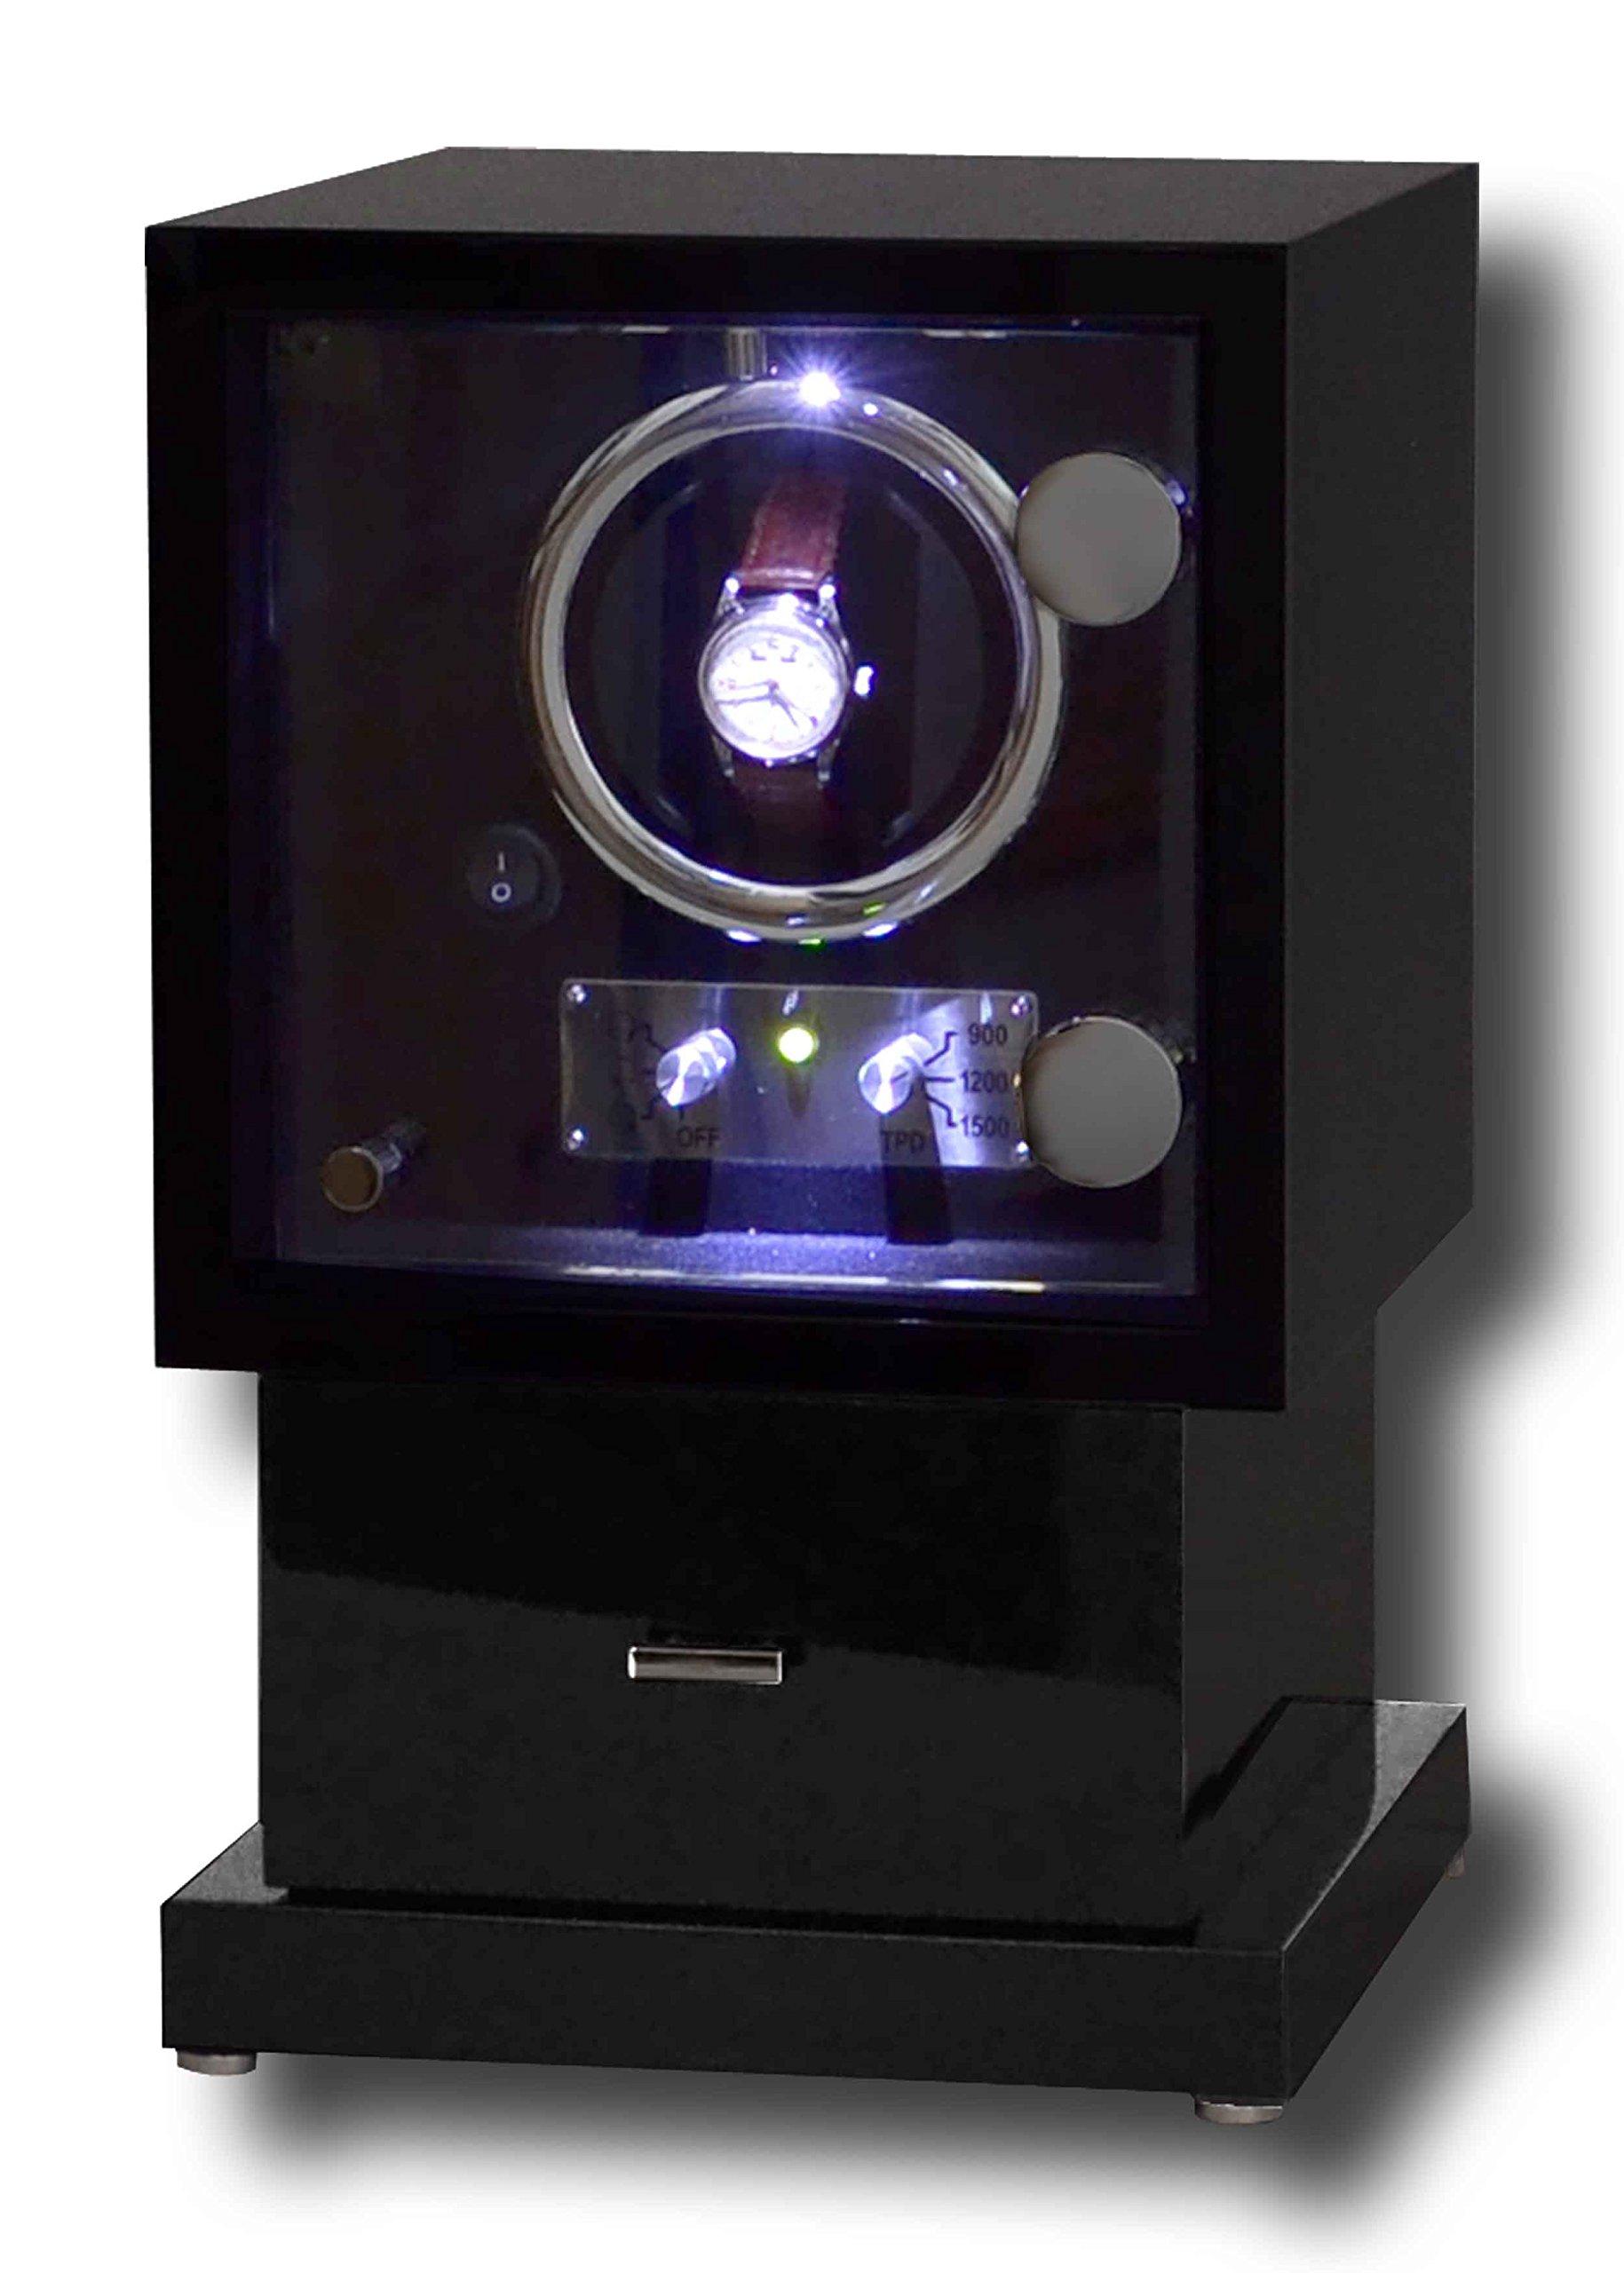 LED Watch Winder Black Piano Wood Chrome Finish (Single Watch Winder with 4 Watch Storage)